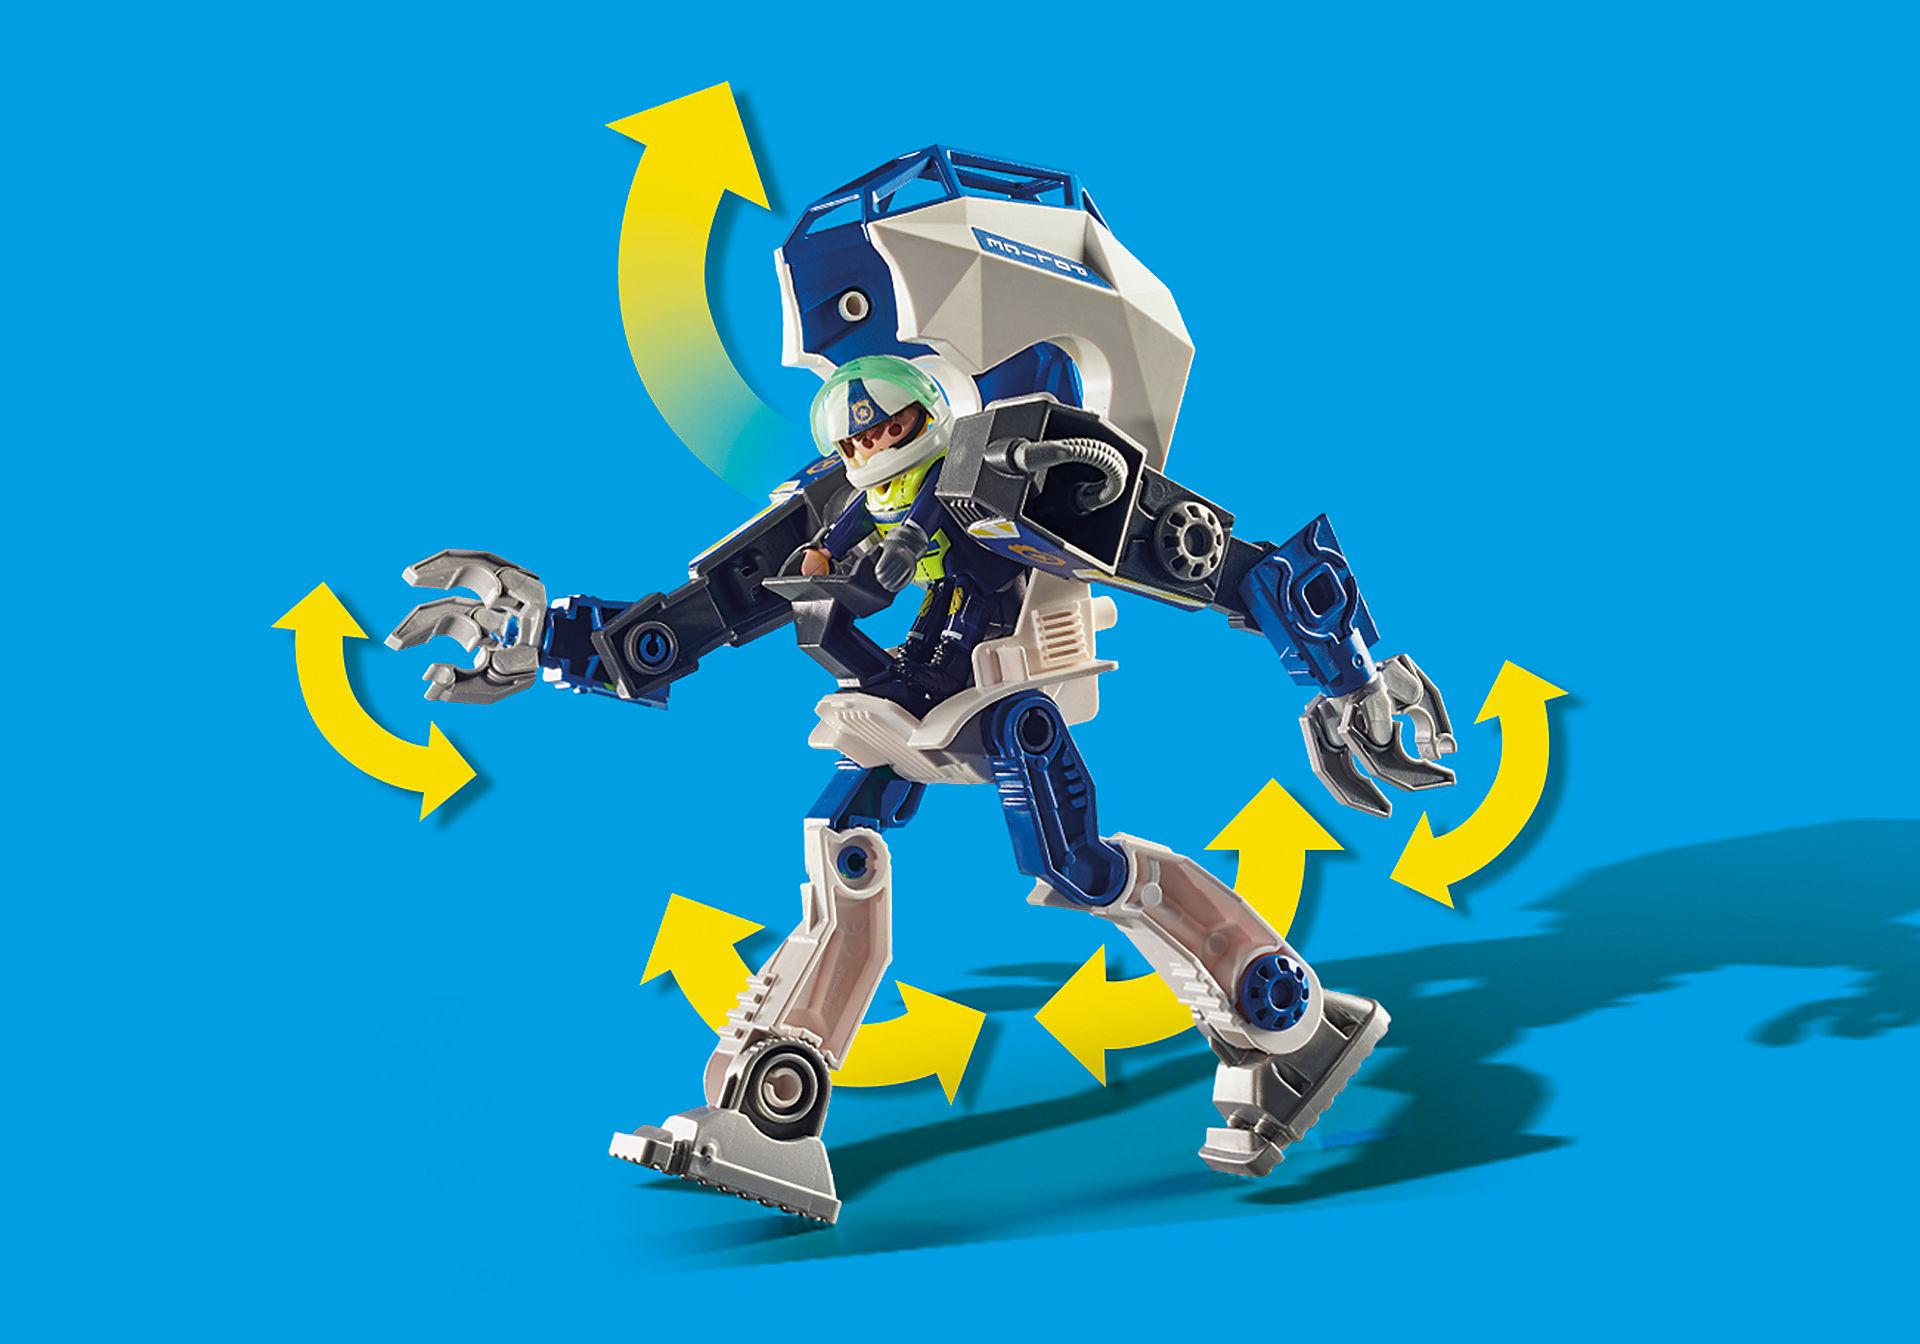 70571 Polizei-Roboter: Spezialeinsatz zoom image8